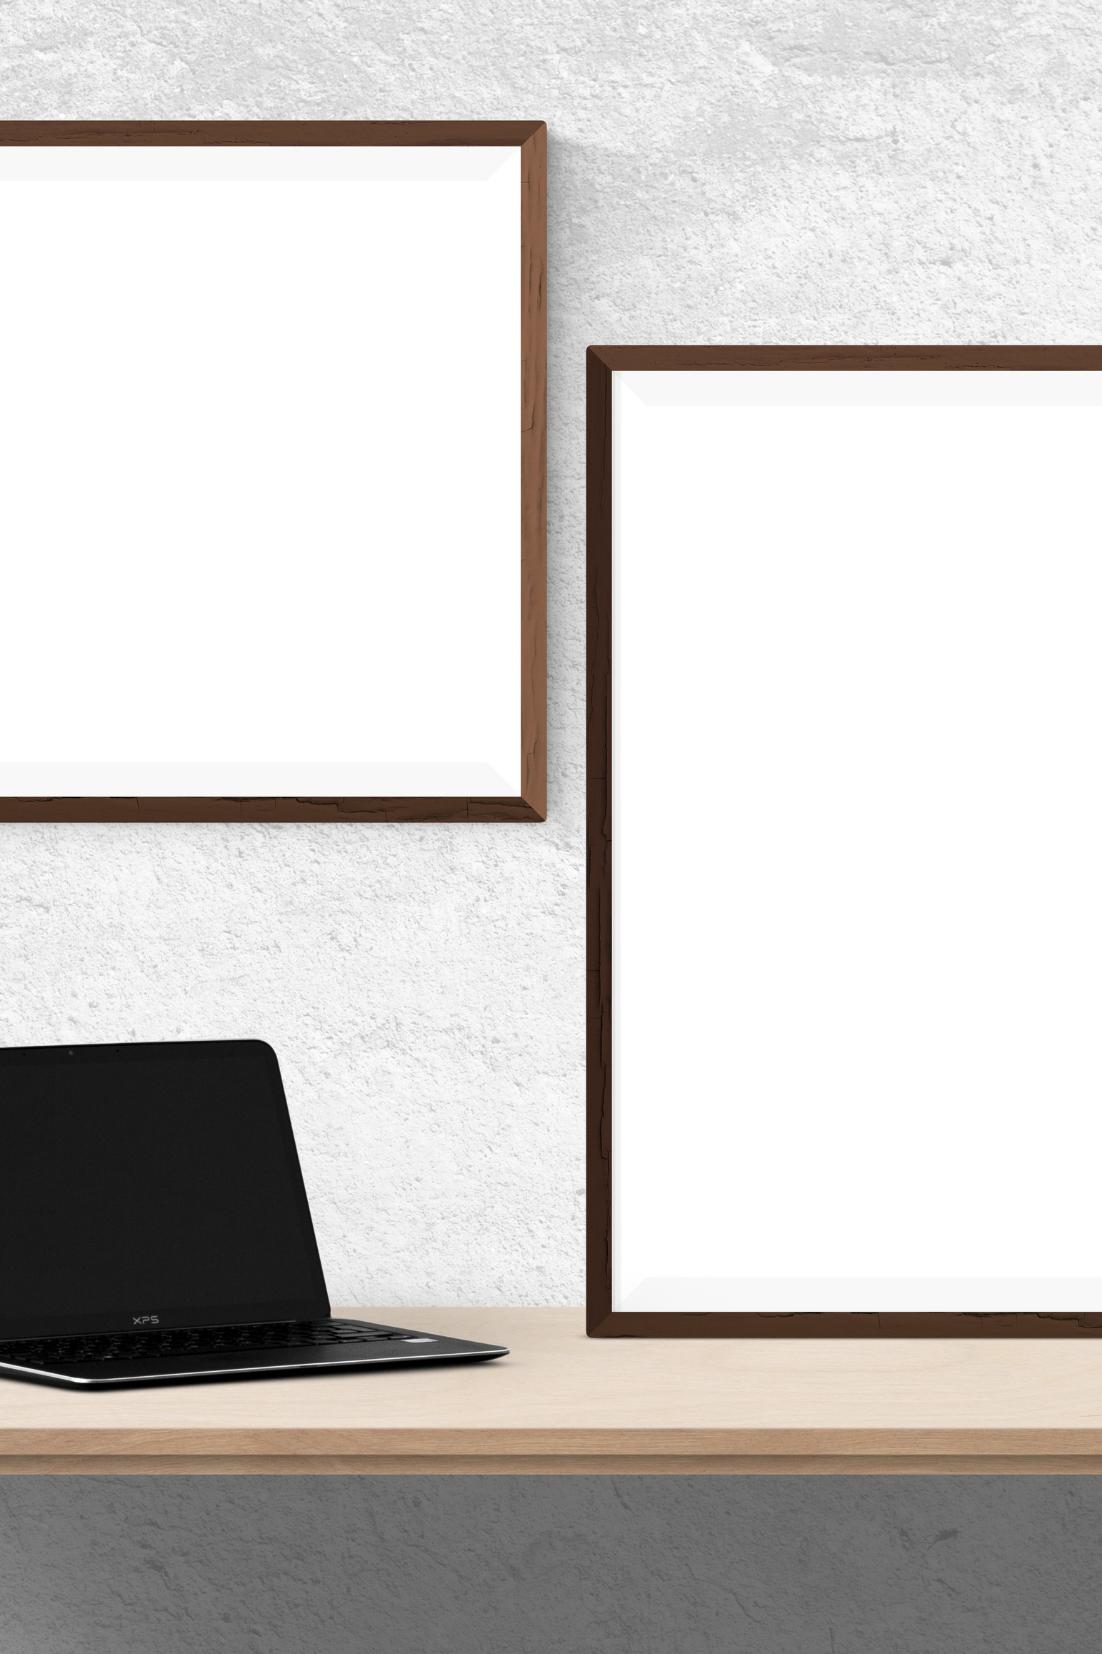 2 frames, desk & laptop depicting Consulting for Van Dusen Nutrition